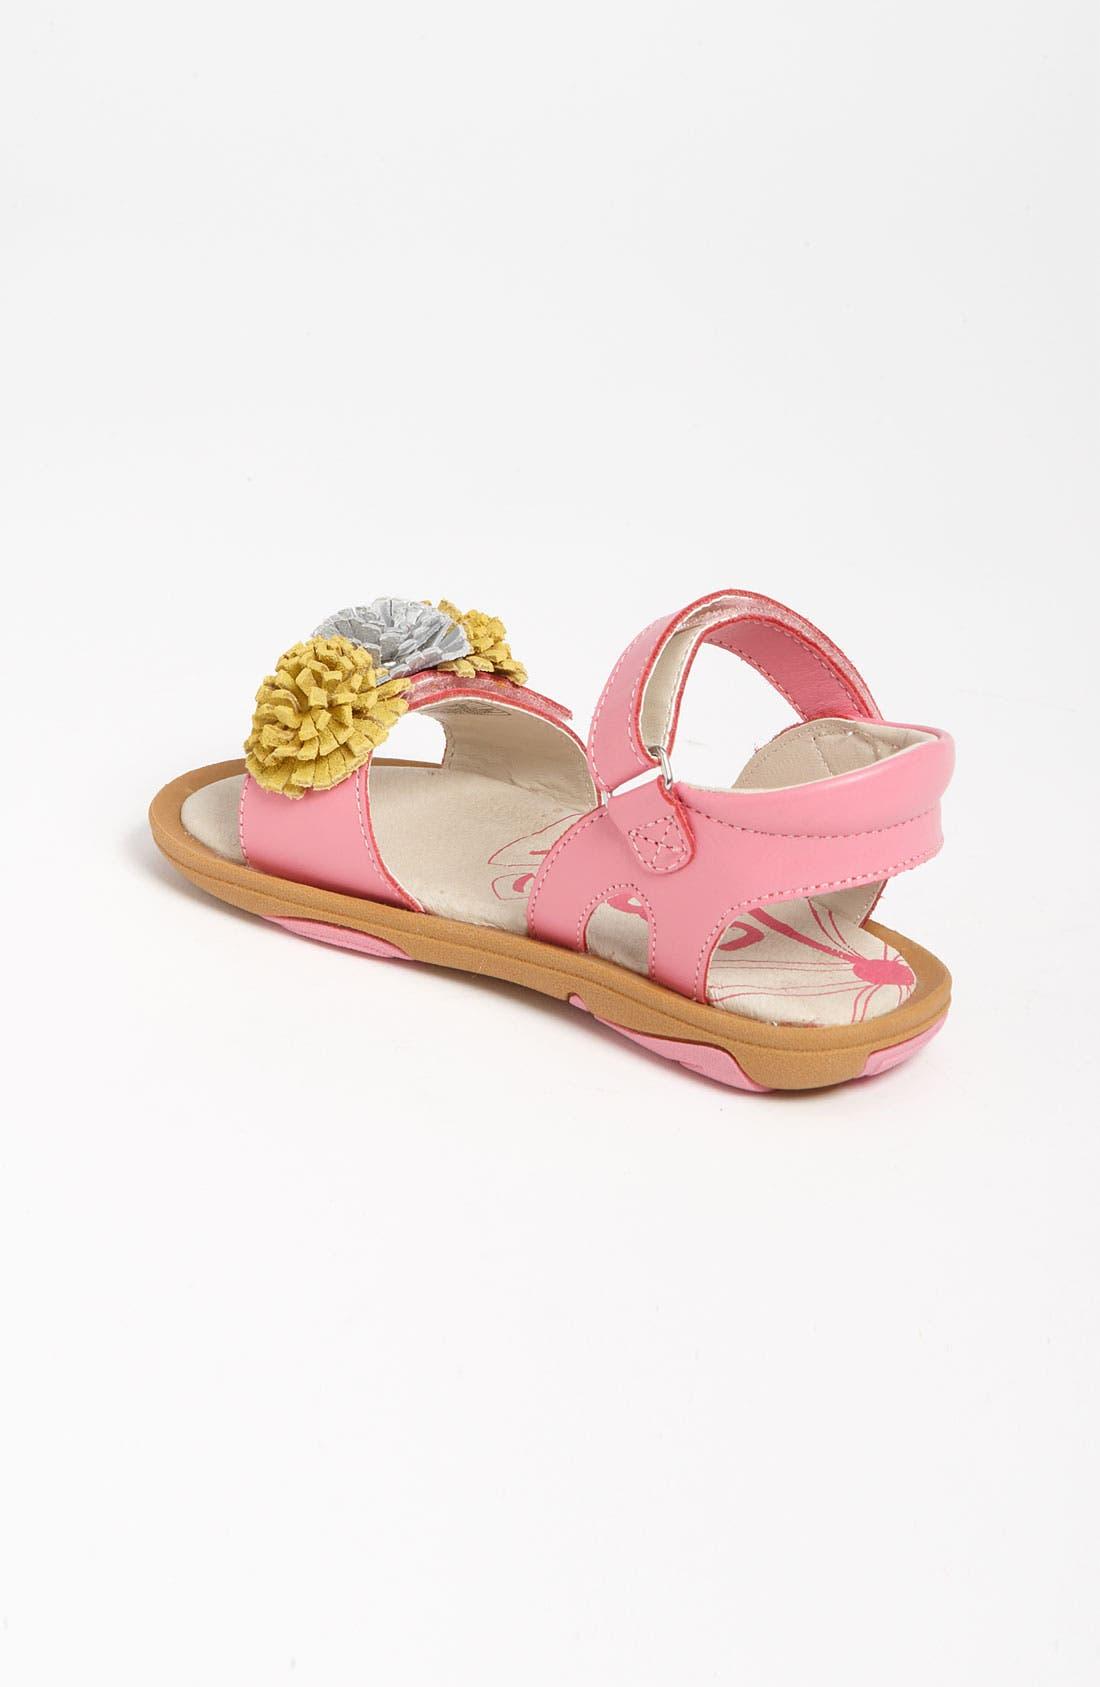 Alternate Image 2  - Umi 'Serenna' Adjustable Sandal (Toddler, Little Kid & Big Kid)